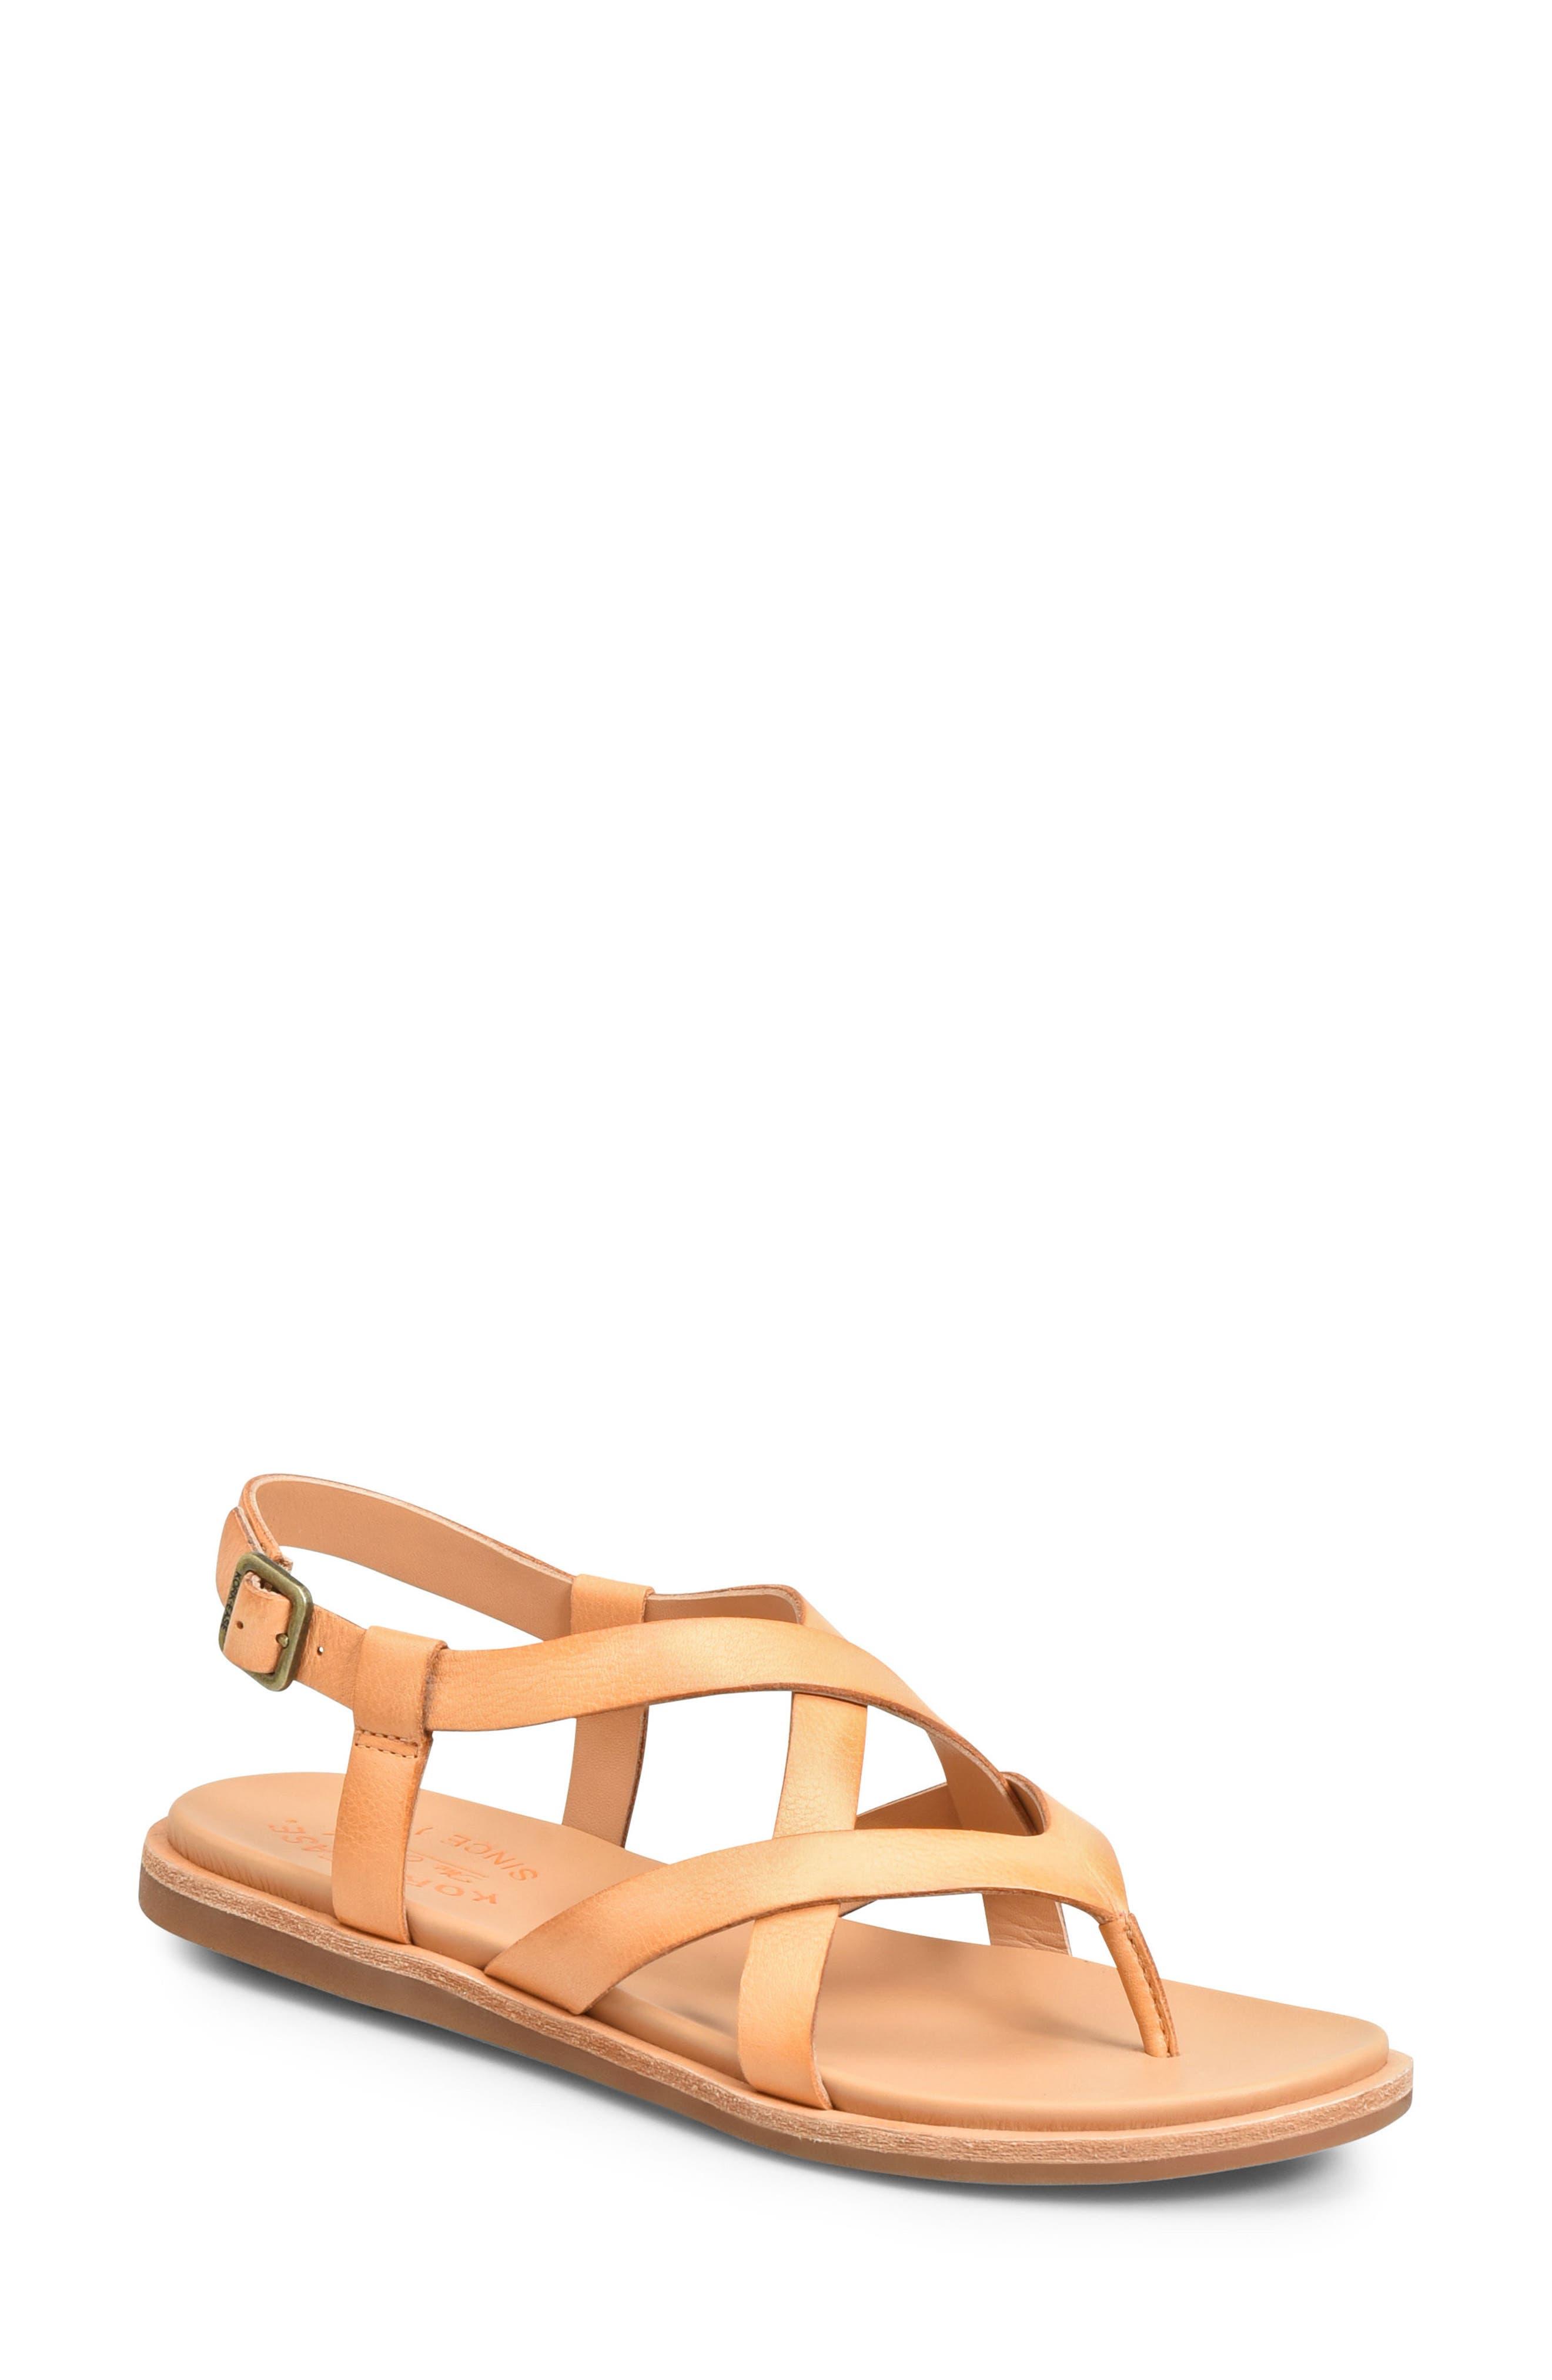 Yarbrough Sandal, Main, color, ORANGE LEATHER